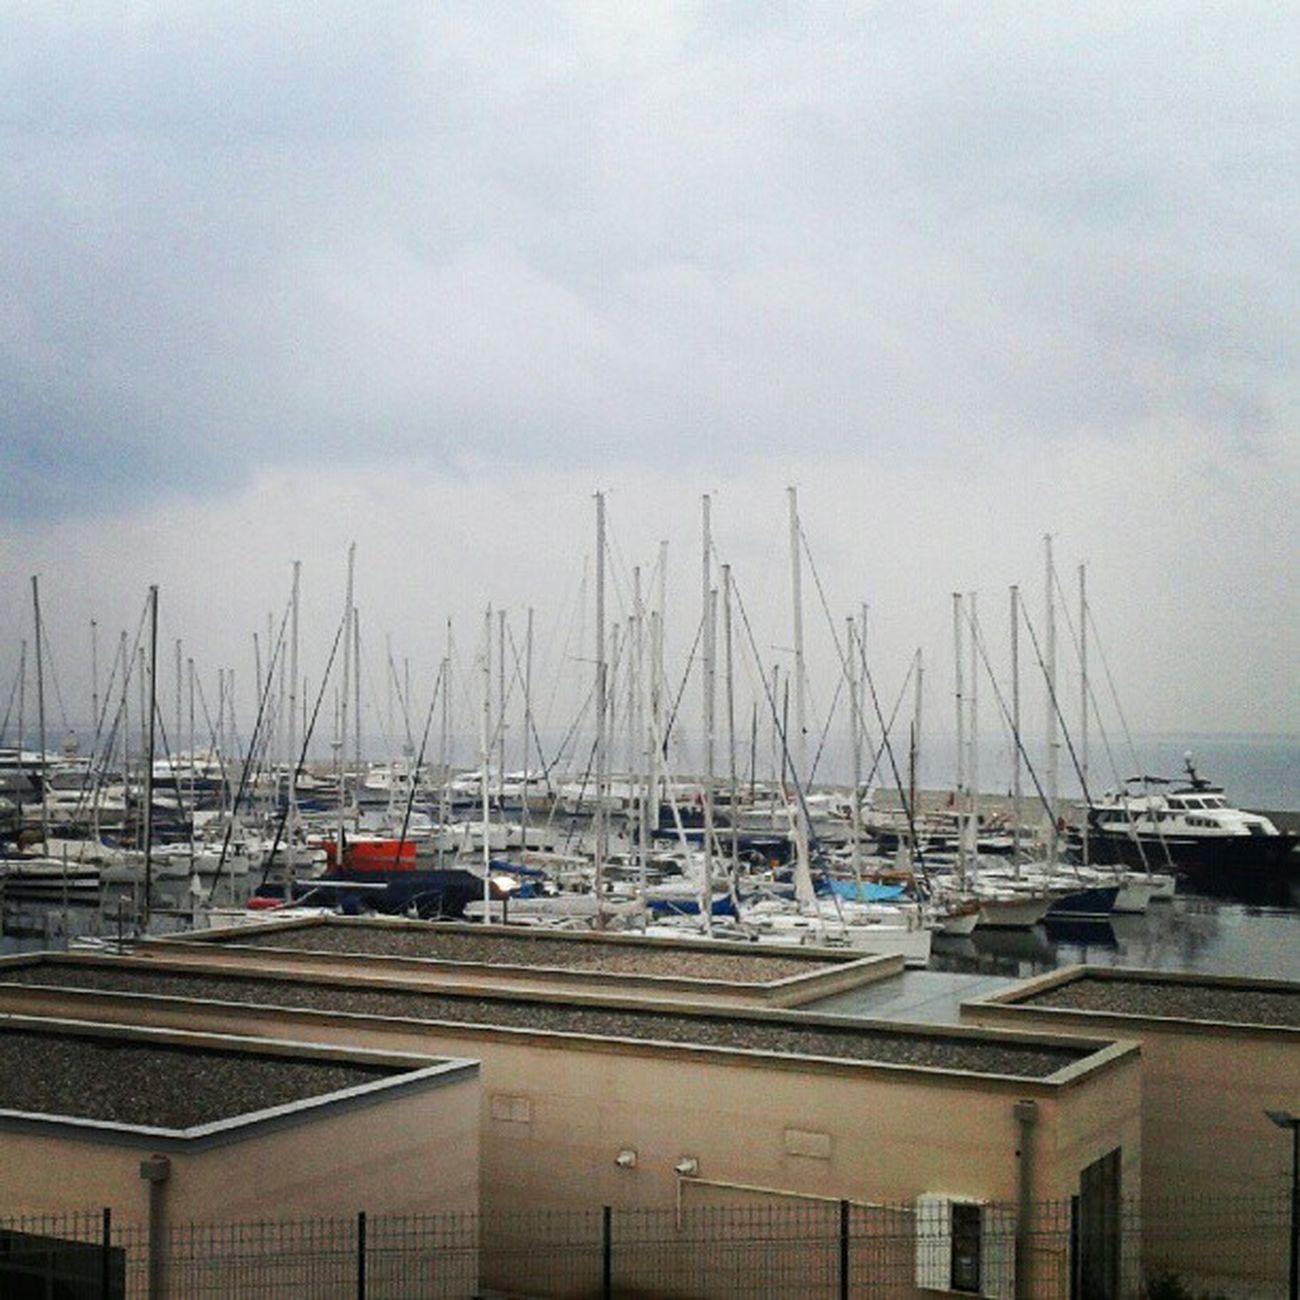 Yacht Sea Seaport Yalova Türkiye Turkey Style Liman Lifestyle Life Enjoy Istanbul Instagram Instabeauty Insta Instagood Instaturkiye View Goodmorning Restaurant